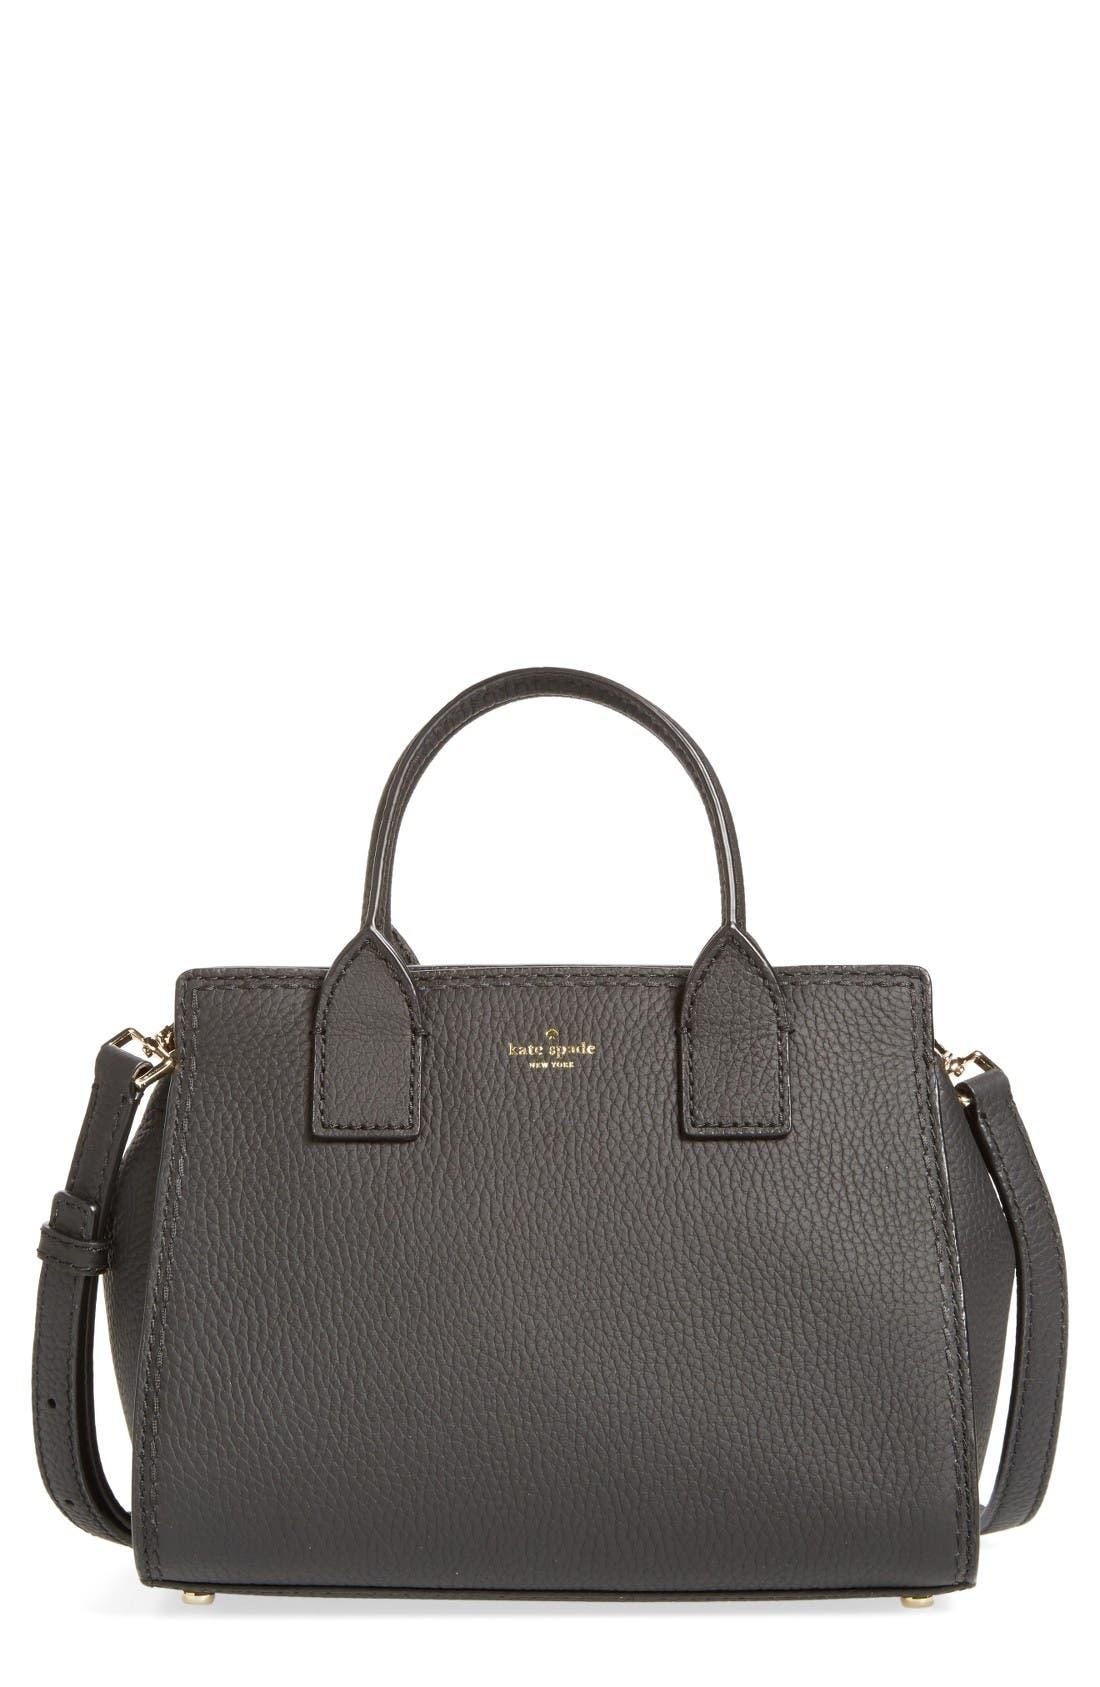 KATE SPADE NEW YORK dunne lane small lake leather satchel